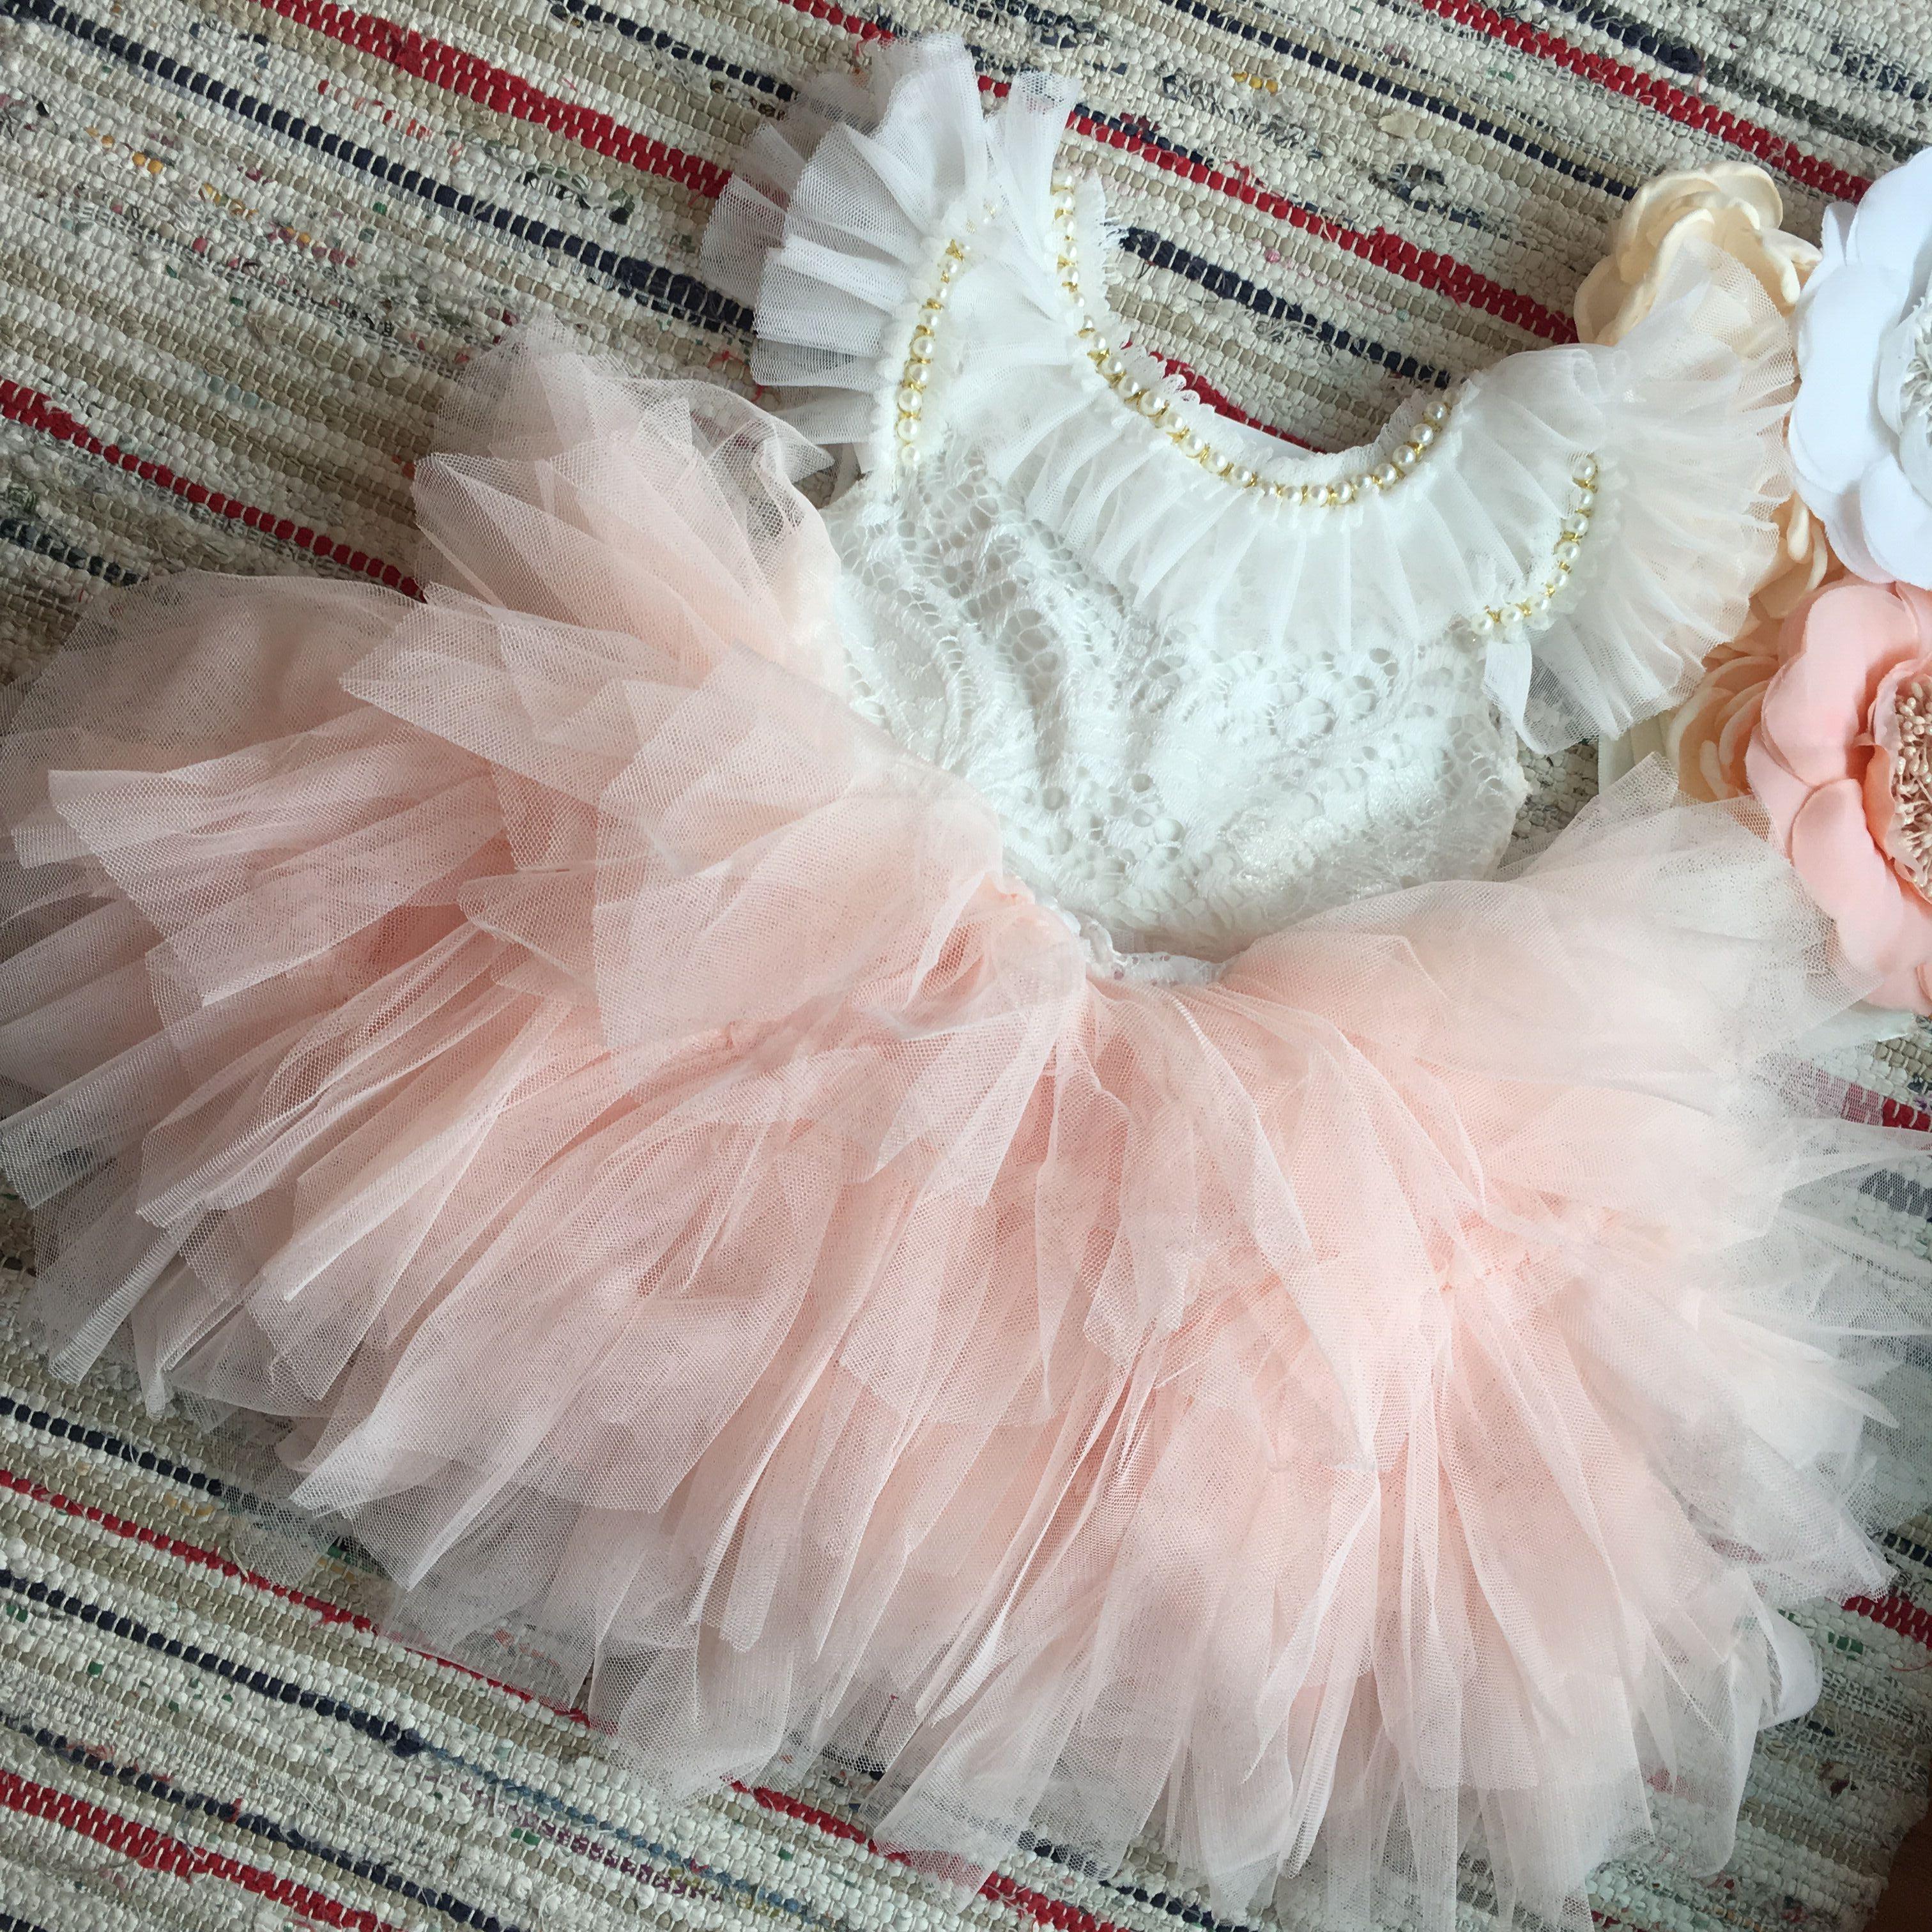 Beautiful flower girls wedding dress children party tutu gown for kids children flowers sashes princess sling summer dress 2